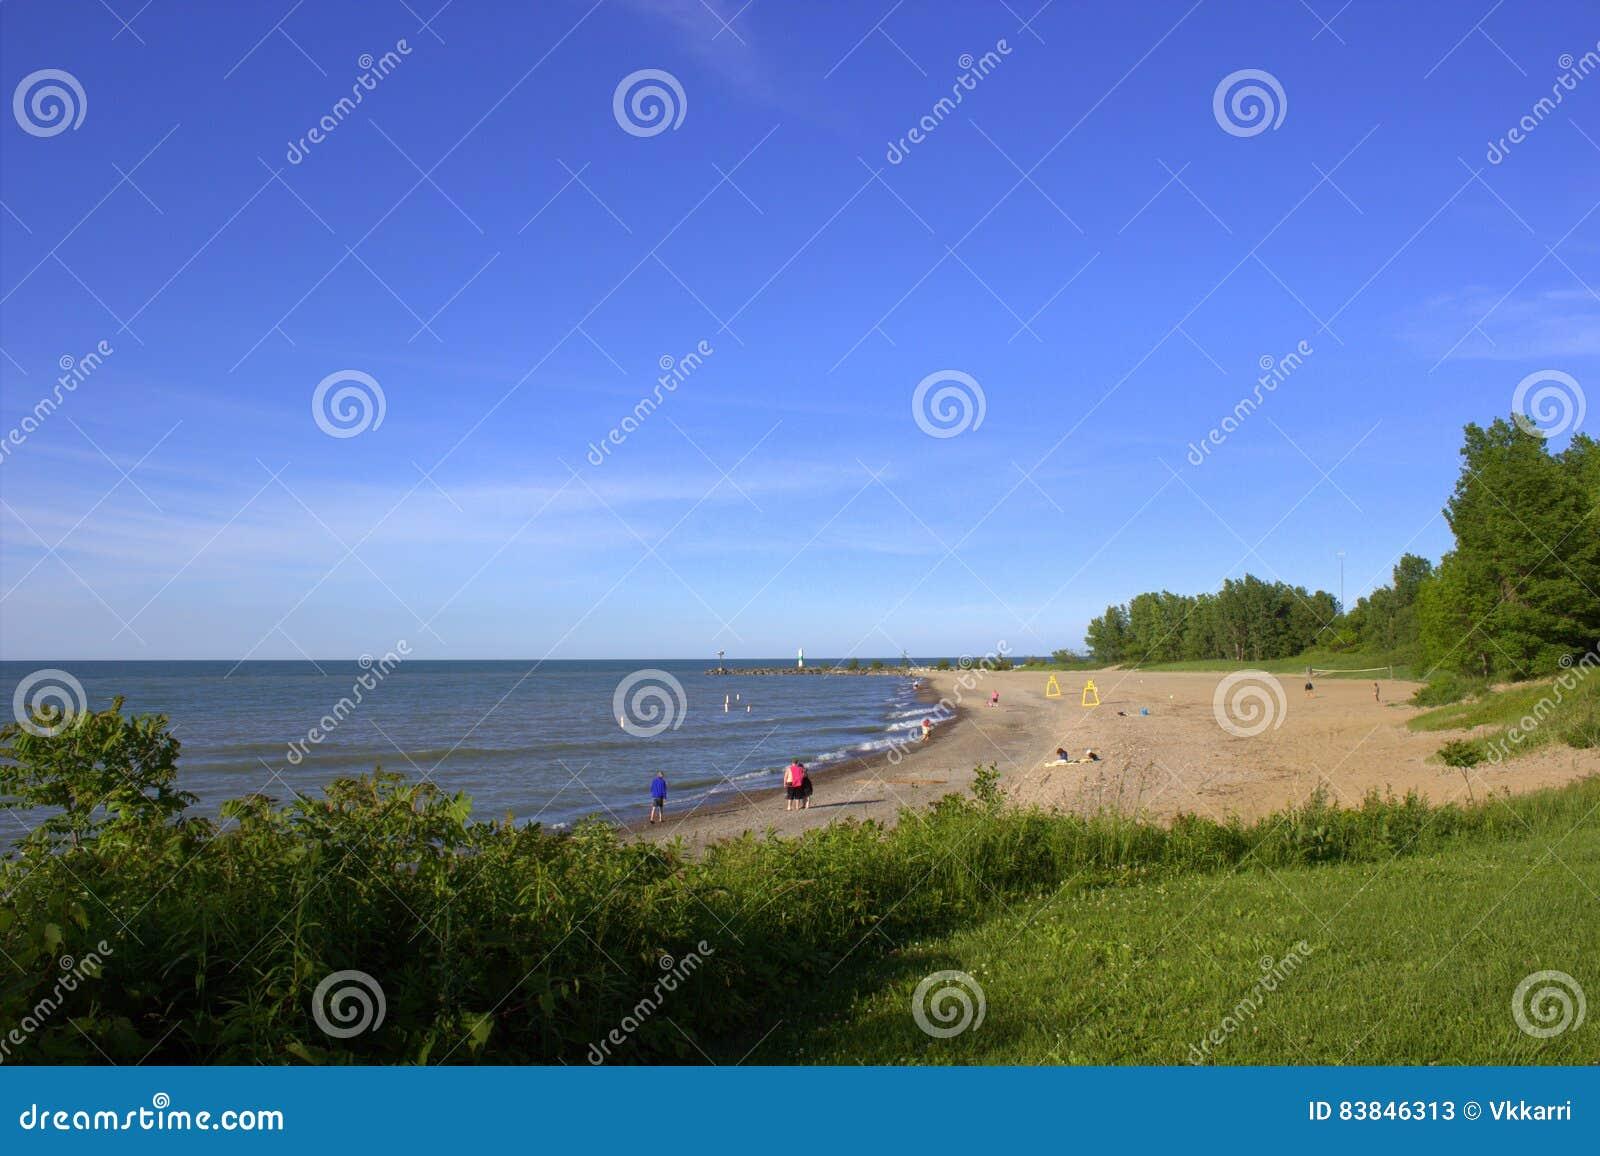 Sunny beach shoreline